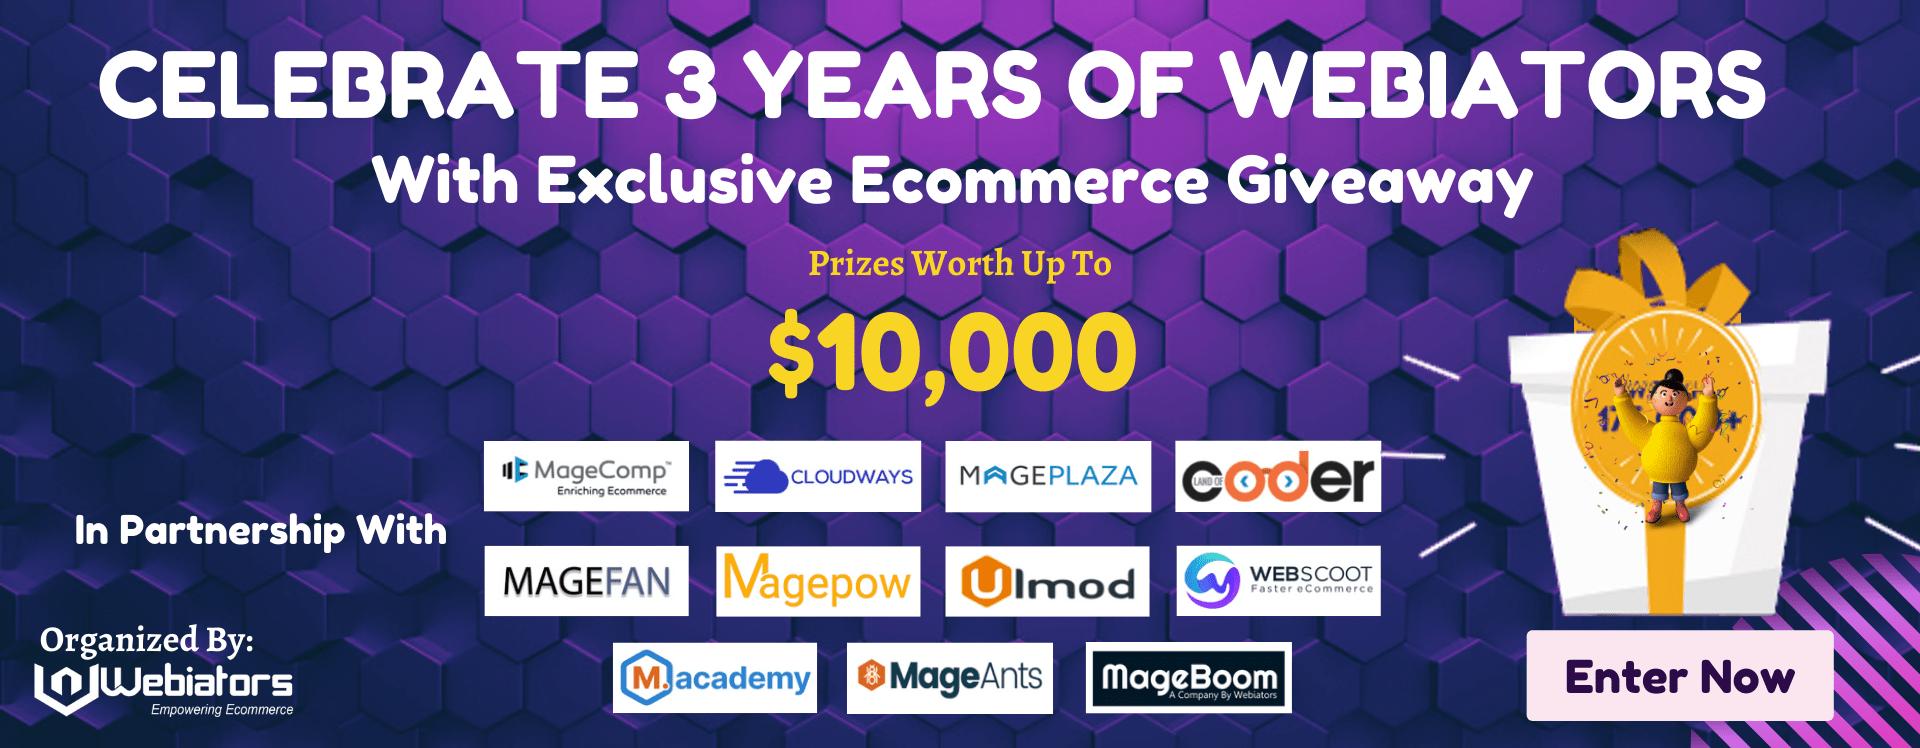 exclusive ecommerce giveaway